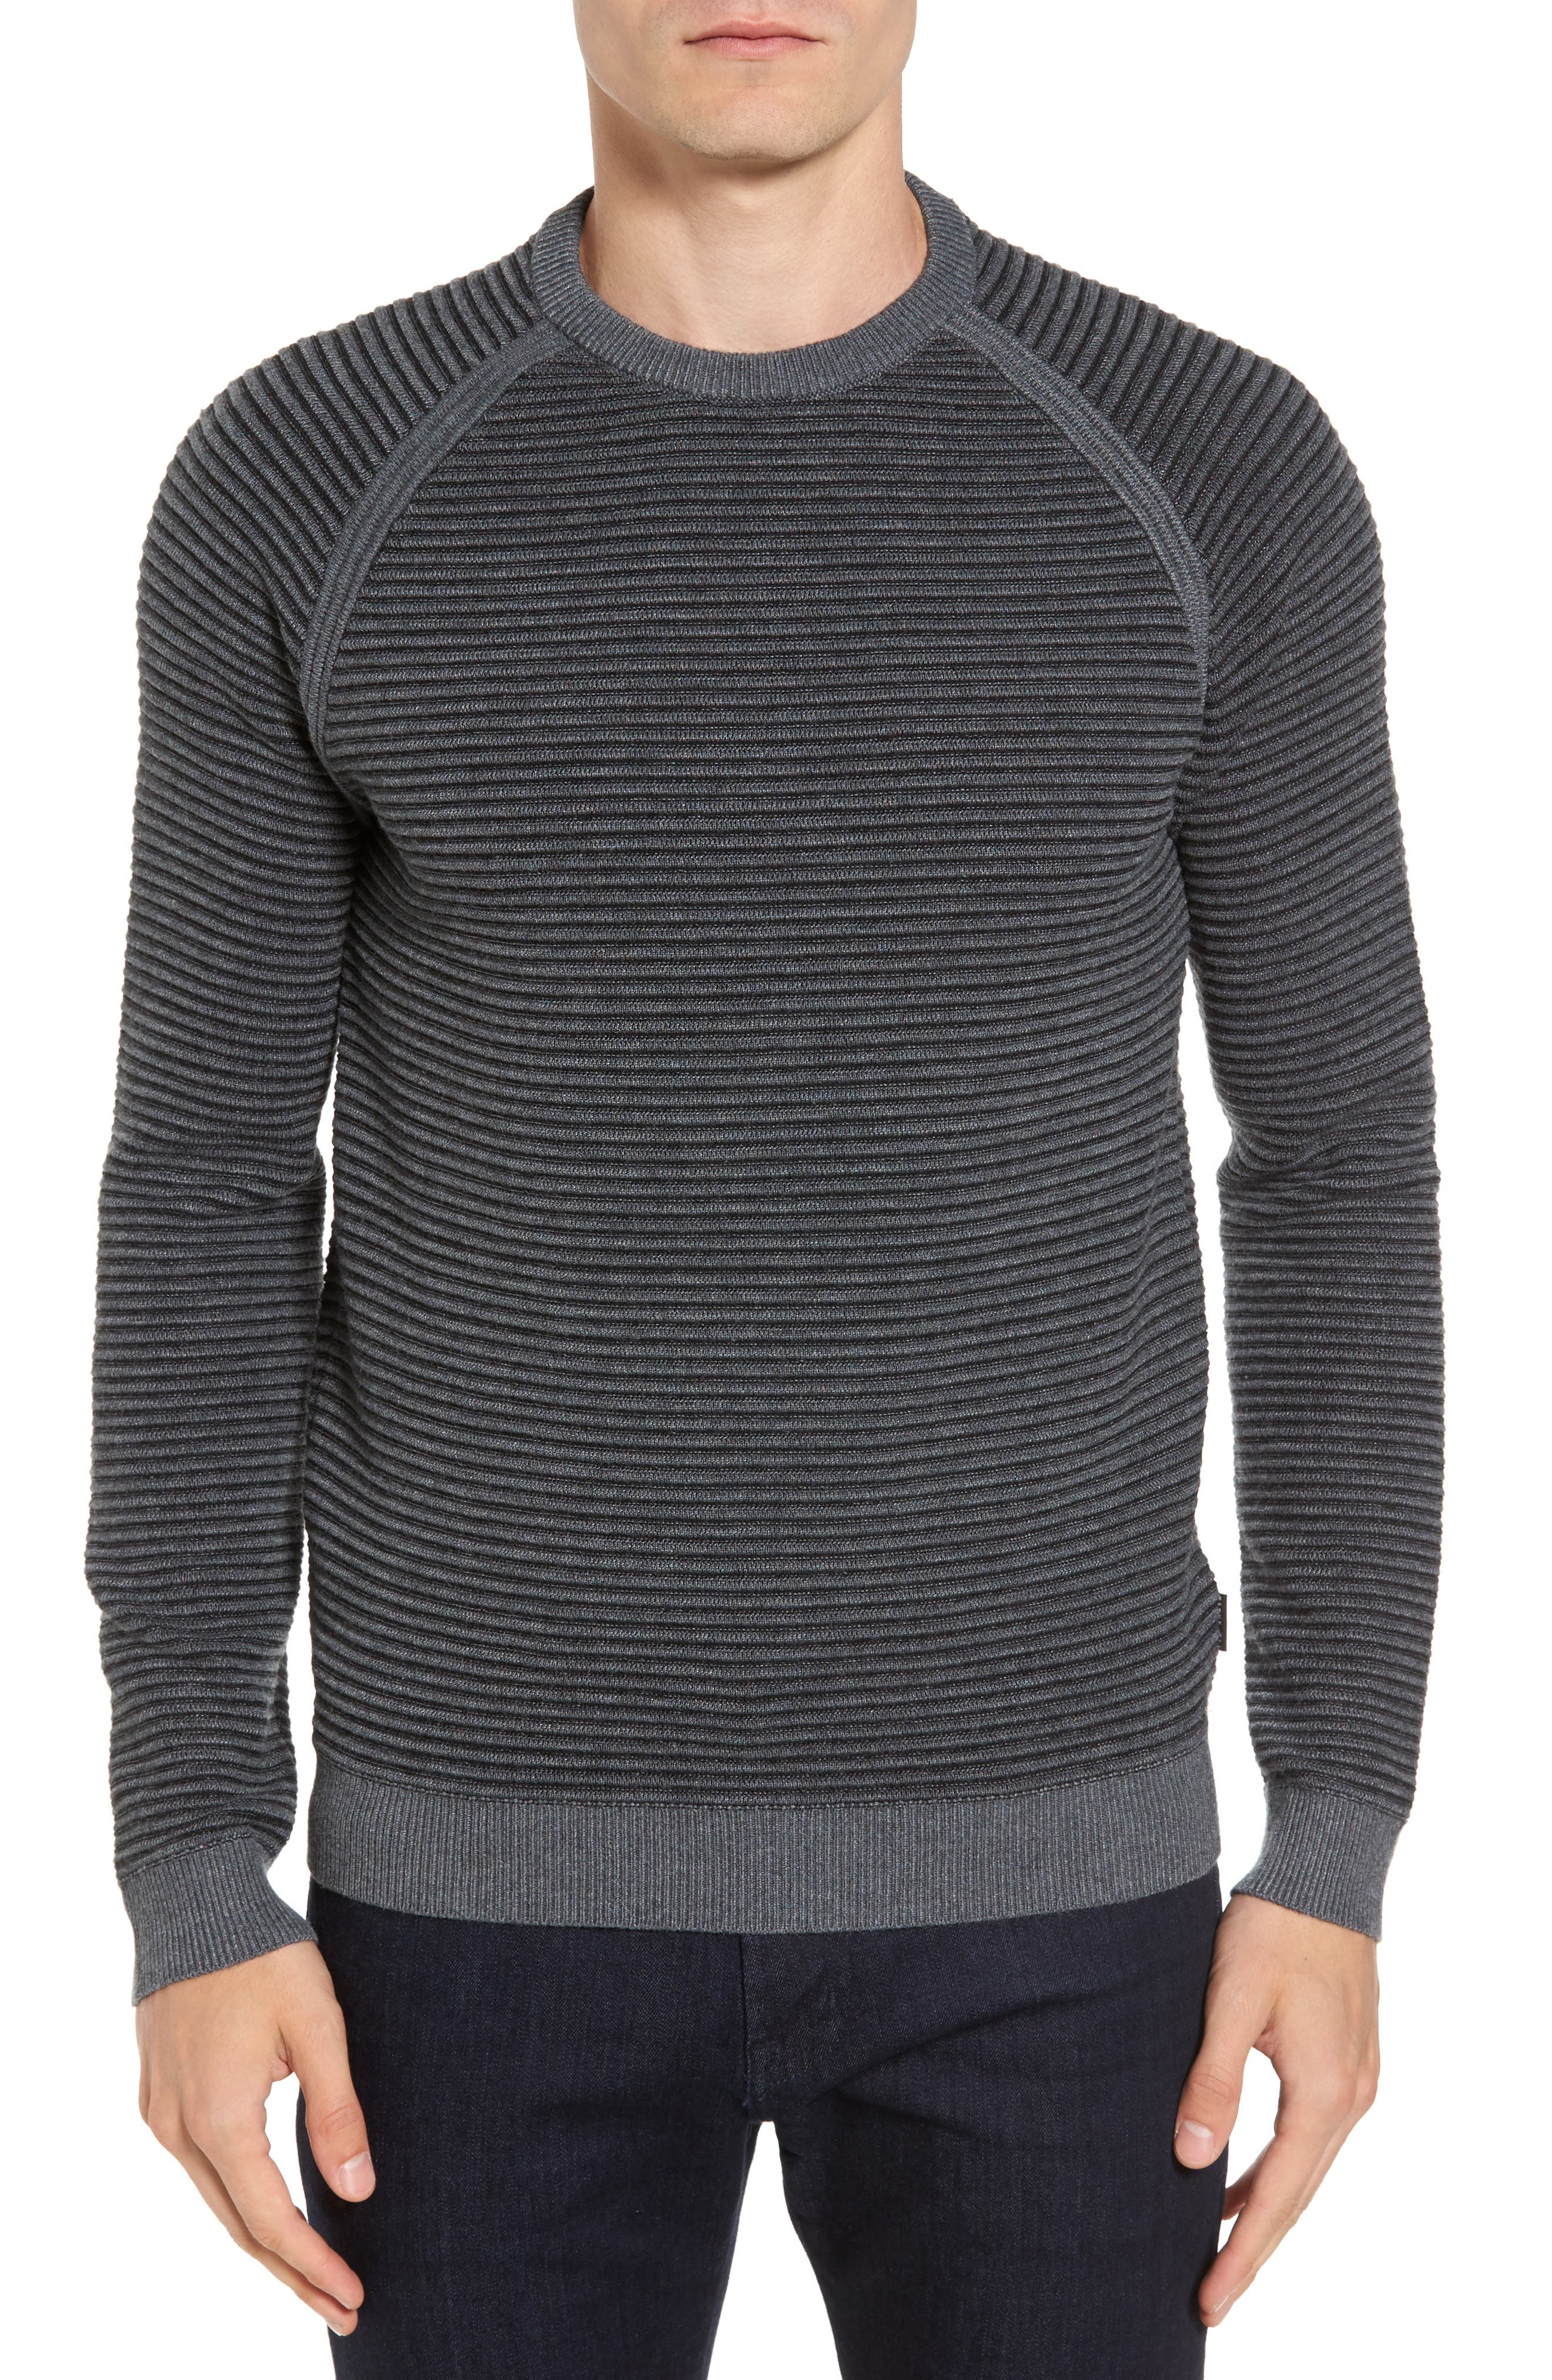 Main Image - Ted Baker London Cashoo Slim Fit Ribbed Sweatshirt